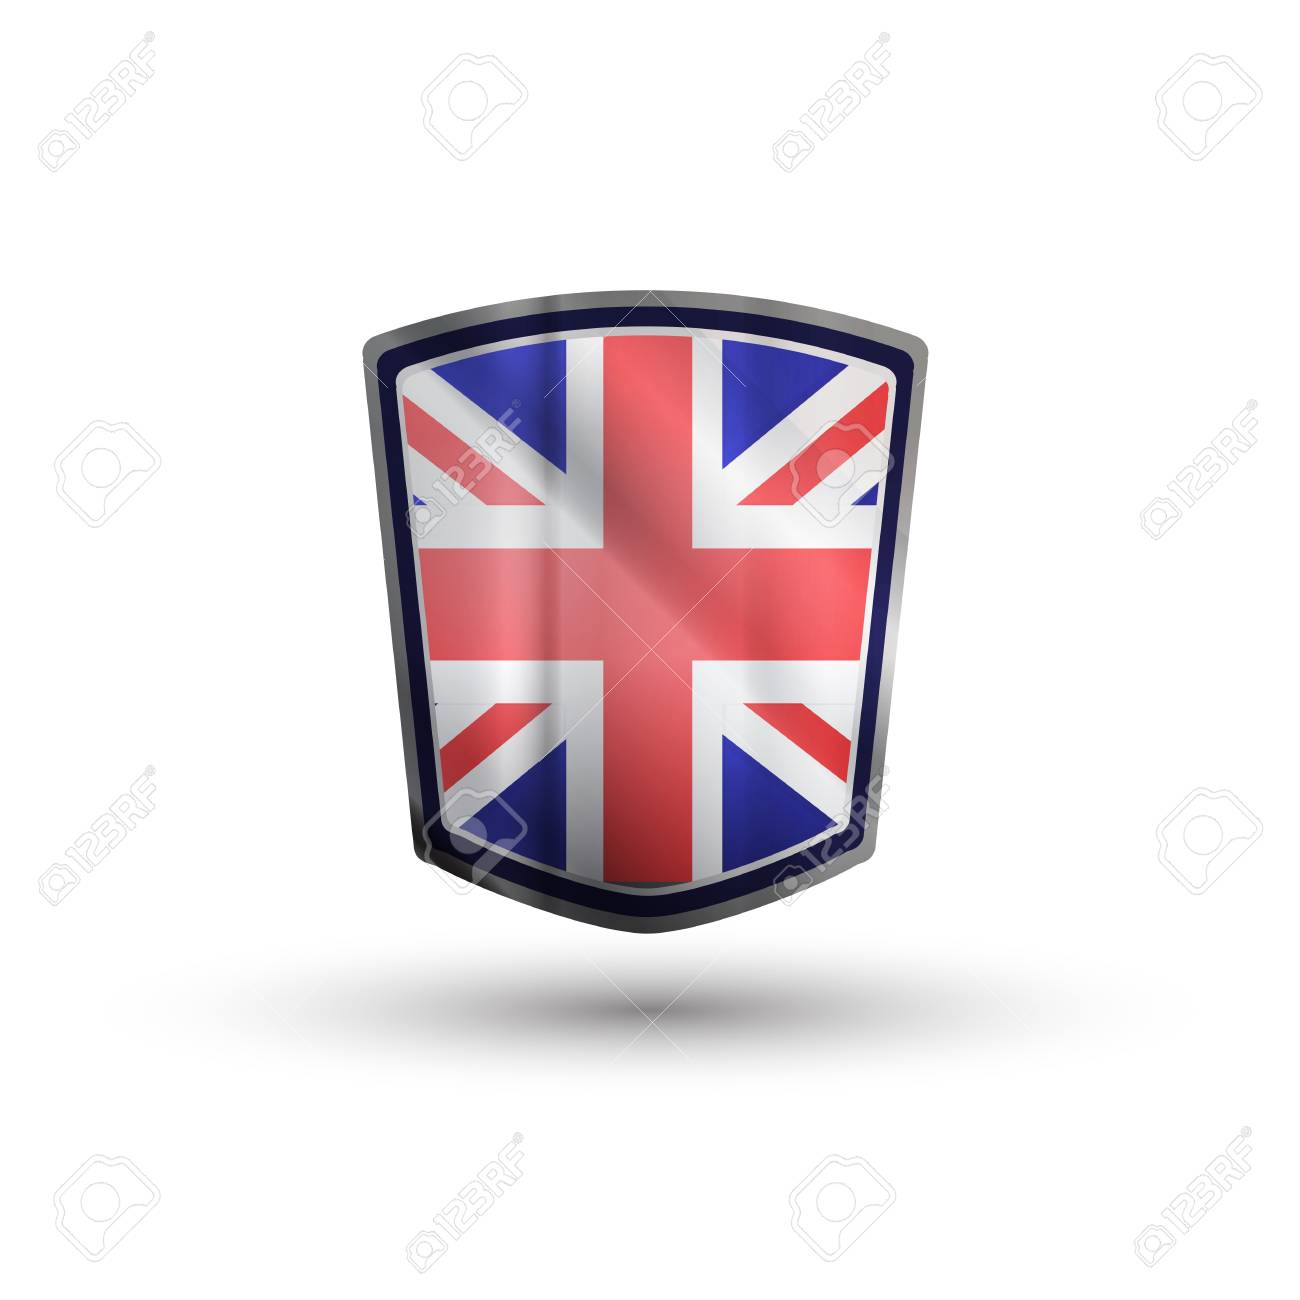 Australia flag on metal shiny shield vector illustration. Stock Photo - 17396976